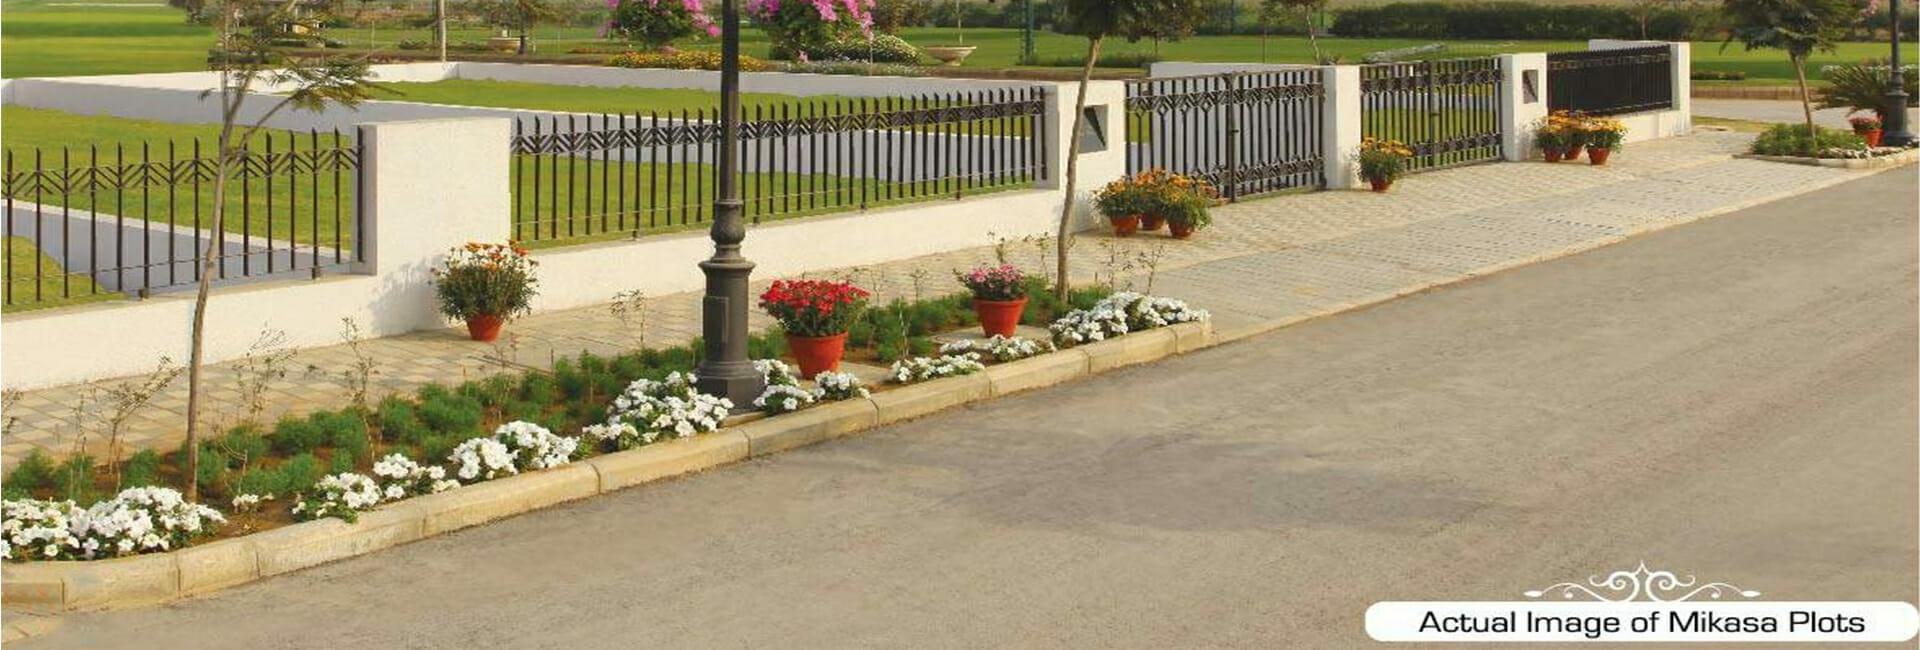 Central Park Flower Valley Mikasa Plots